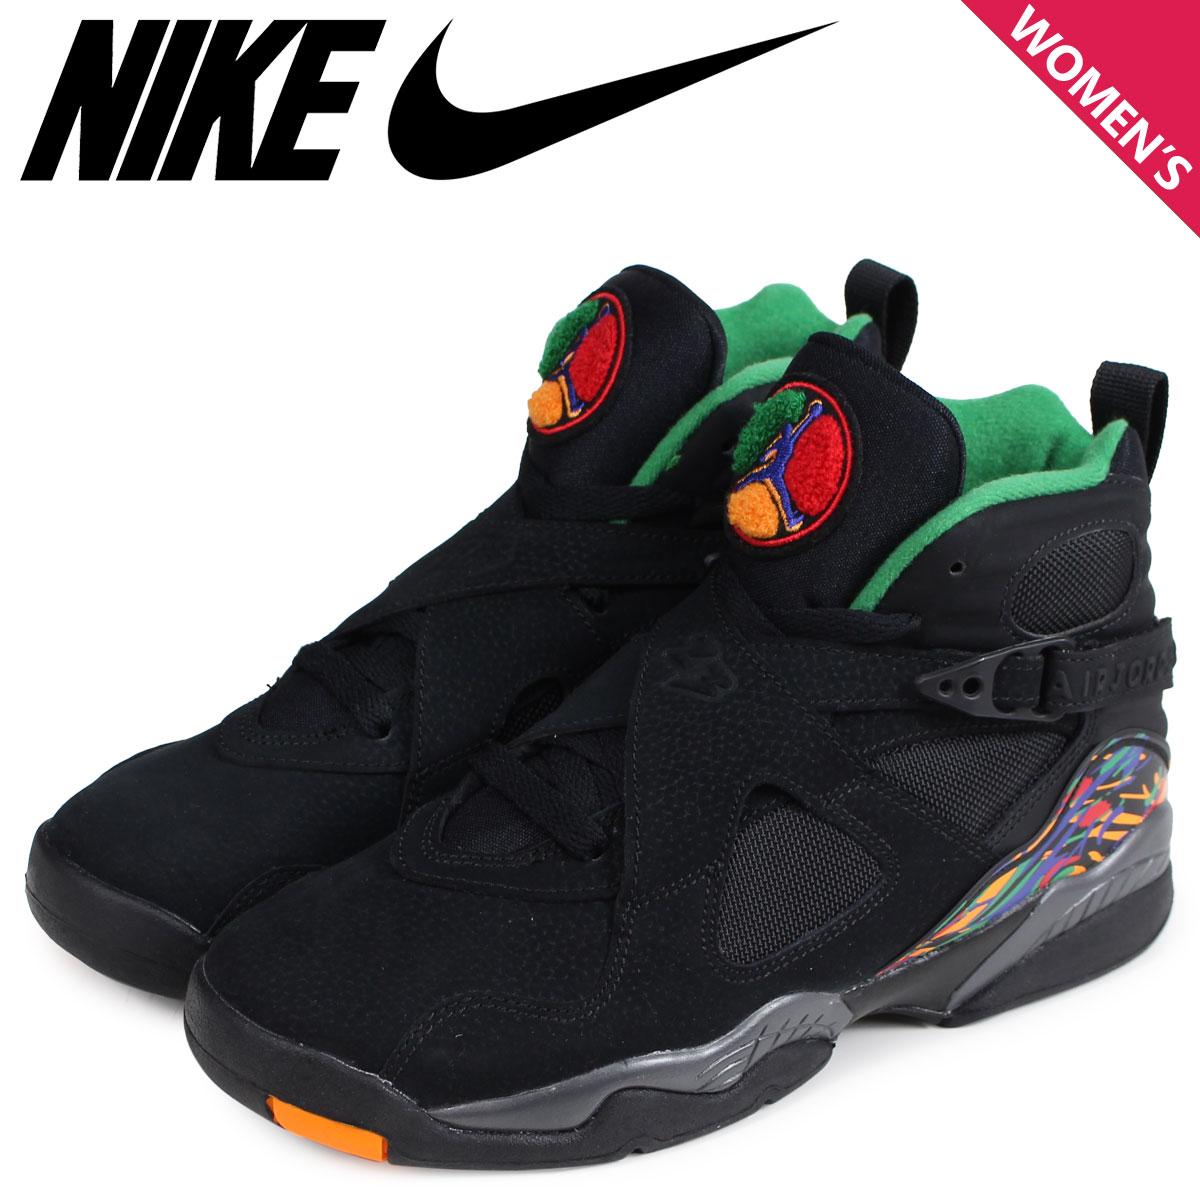 the best attitude 85a8e 40dc3 NIKE Nike Air Jordan 8 nostalgic lady's sneakers AIR JORDAN 8 RETRO GS  305,368-004 black [load planned Shinnyu load in reservation product 1/5 ...